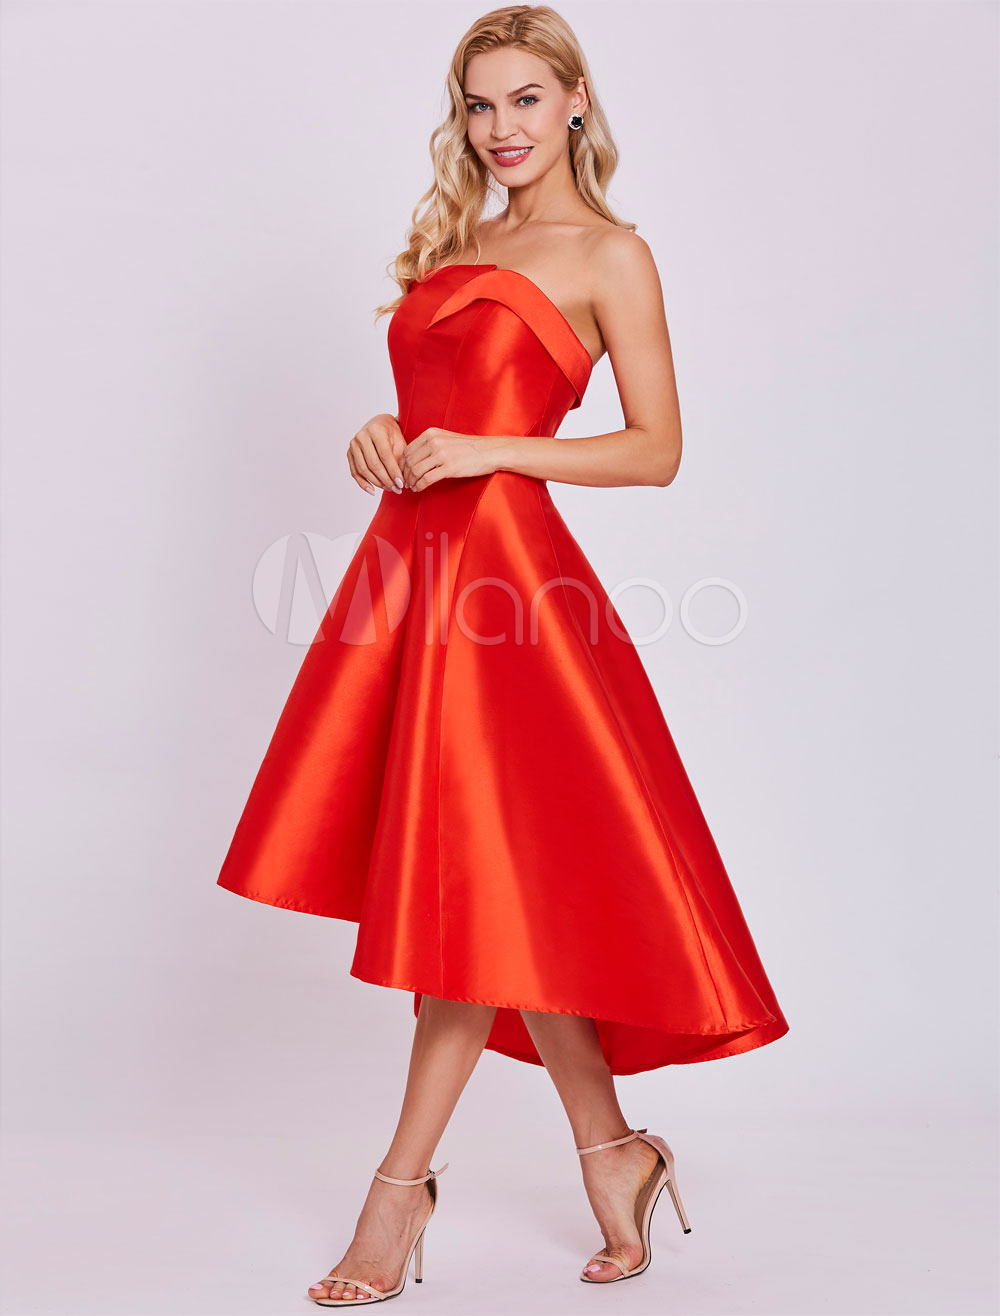 Red Cocktail Dresses Satin High Low Strapless Asymmetrical Short Graduation Dress (Wedding Cheap Party Dress) photo